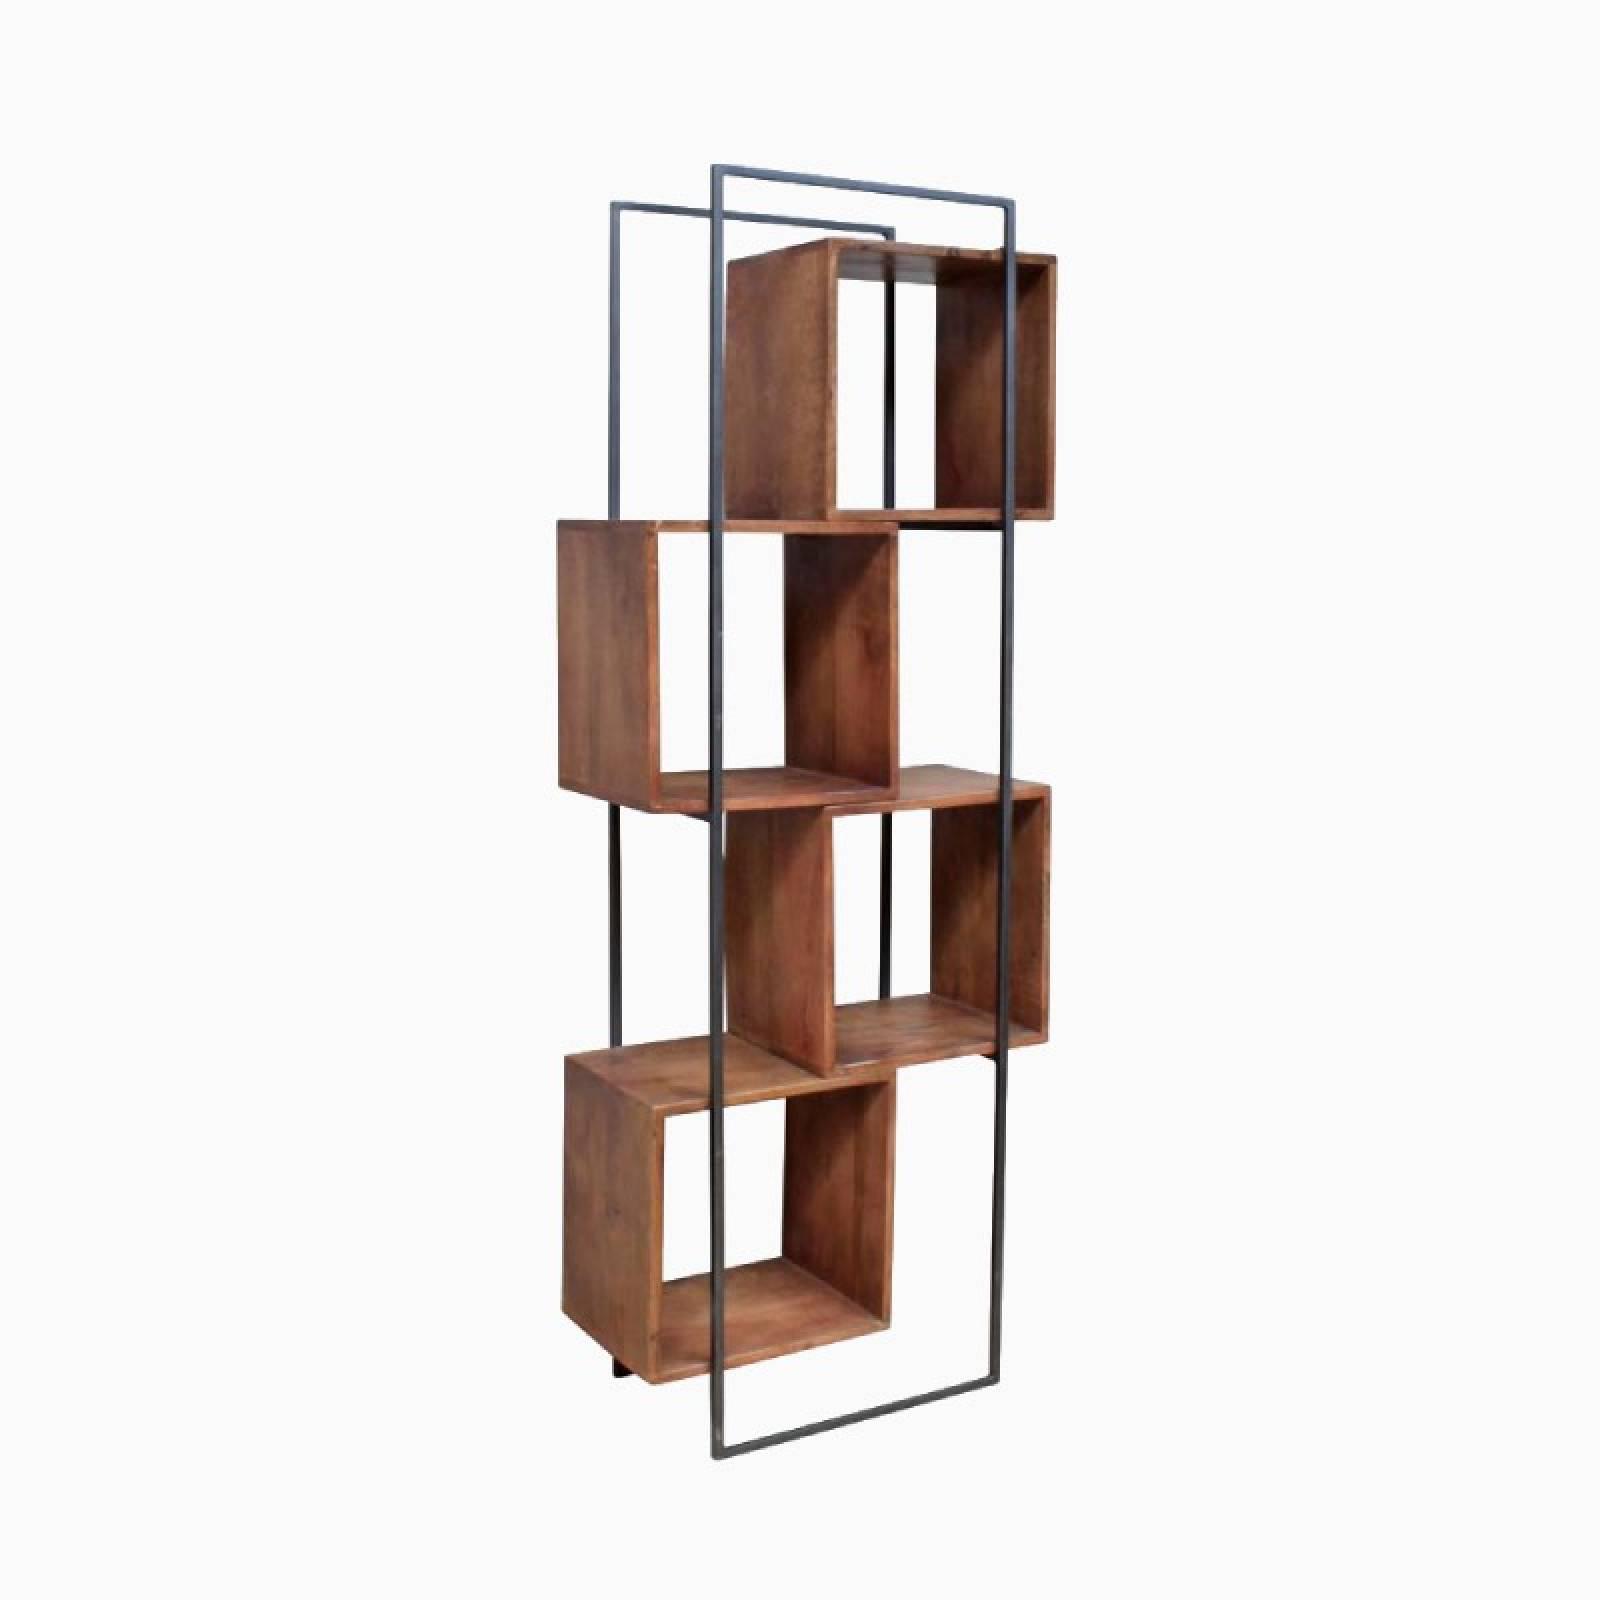 Wood & Metal Offset Quadrant Tall Shelving Unit